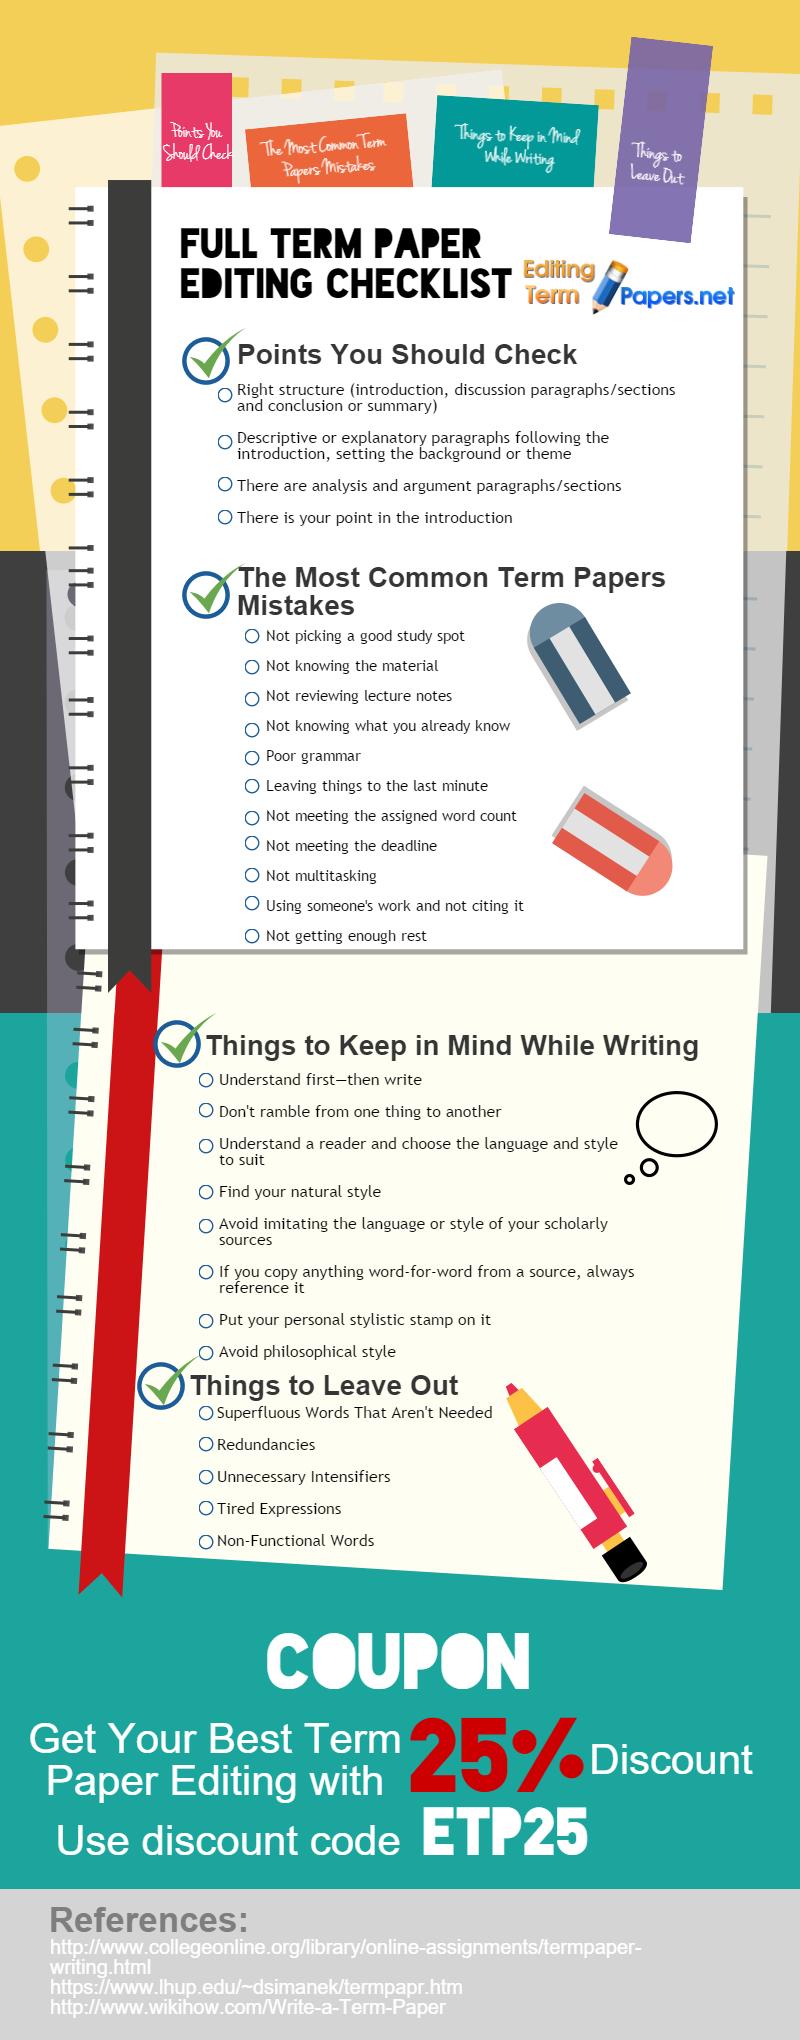 Full Term Paper Editing Checklist